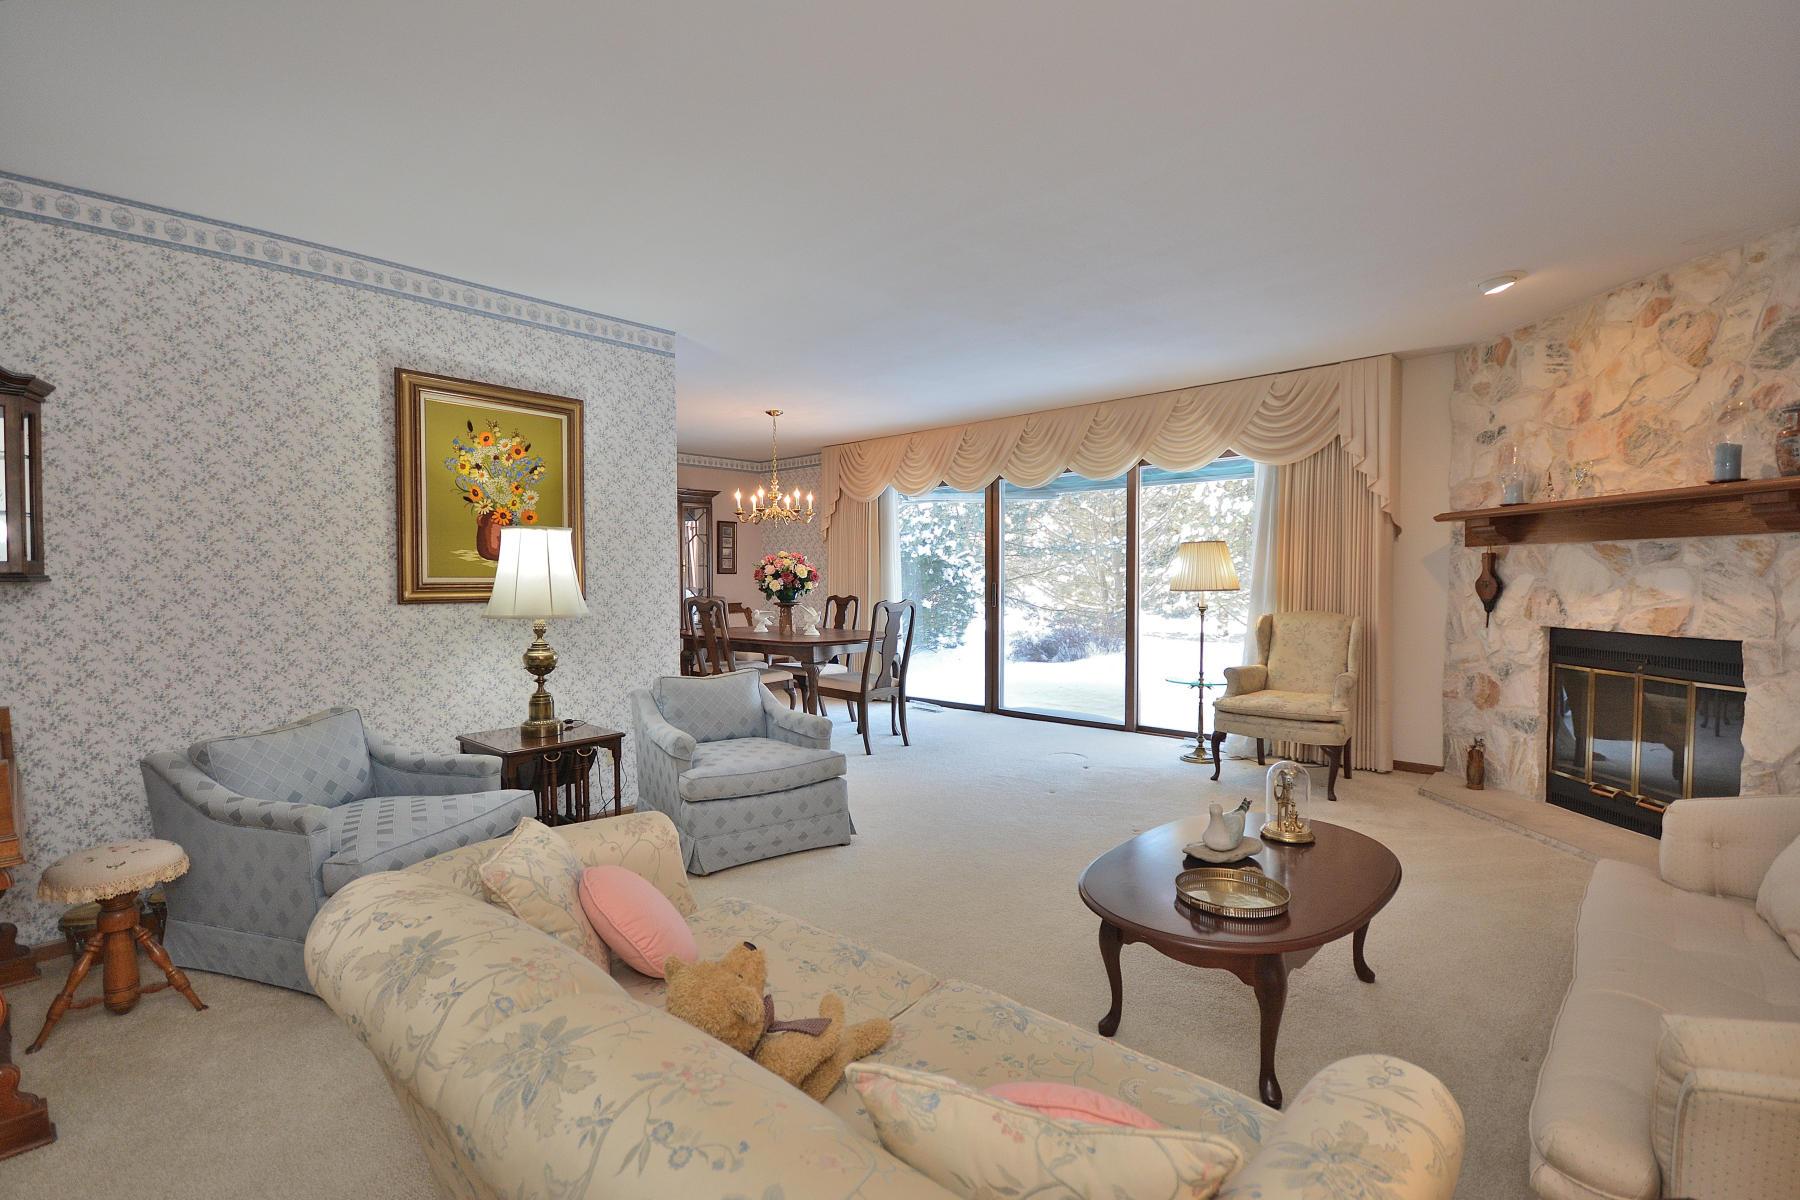 3725 Yukon Rd, Brookfield, Wisconsin 53045, 2 Bedrooms Bedrooms, 6 Rooms Rooms,2 BathroomsBathrooms,Condominiums,For Sale,Yukon Rd,1,1621681